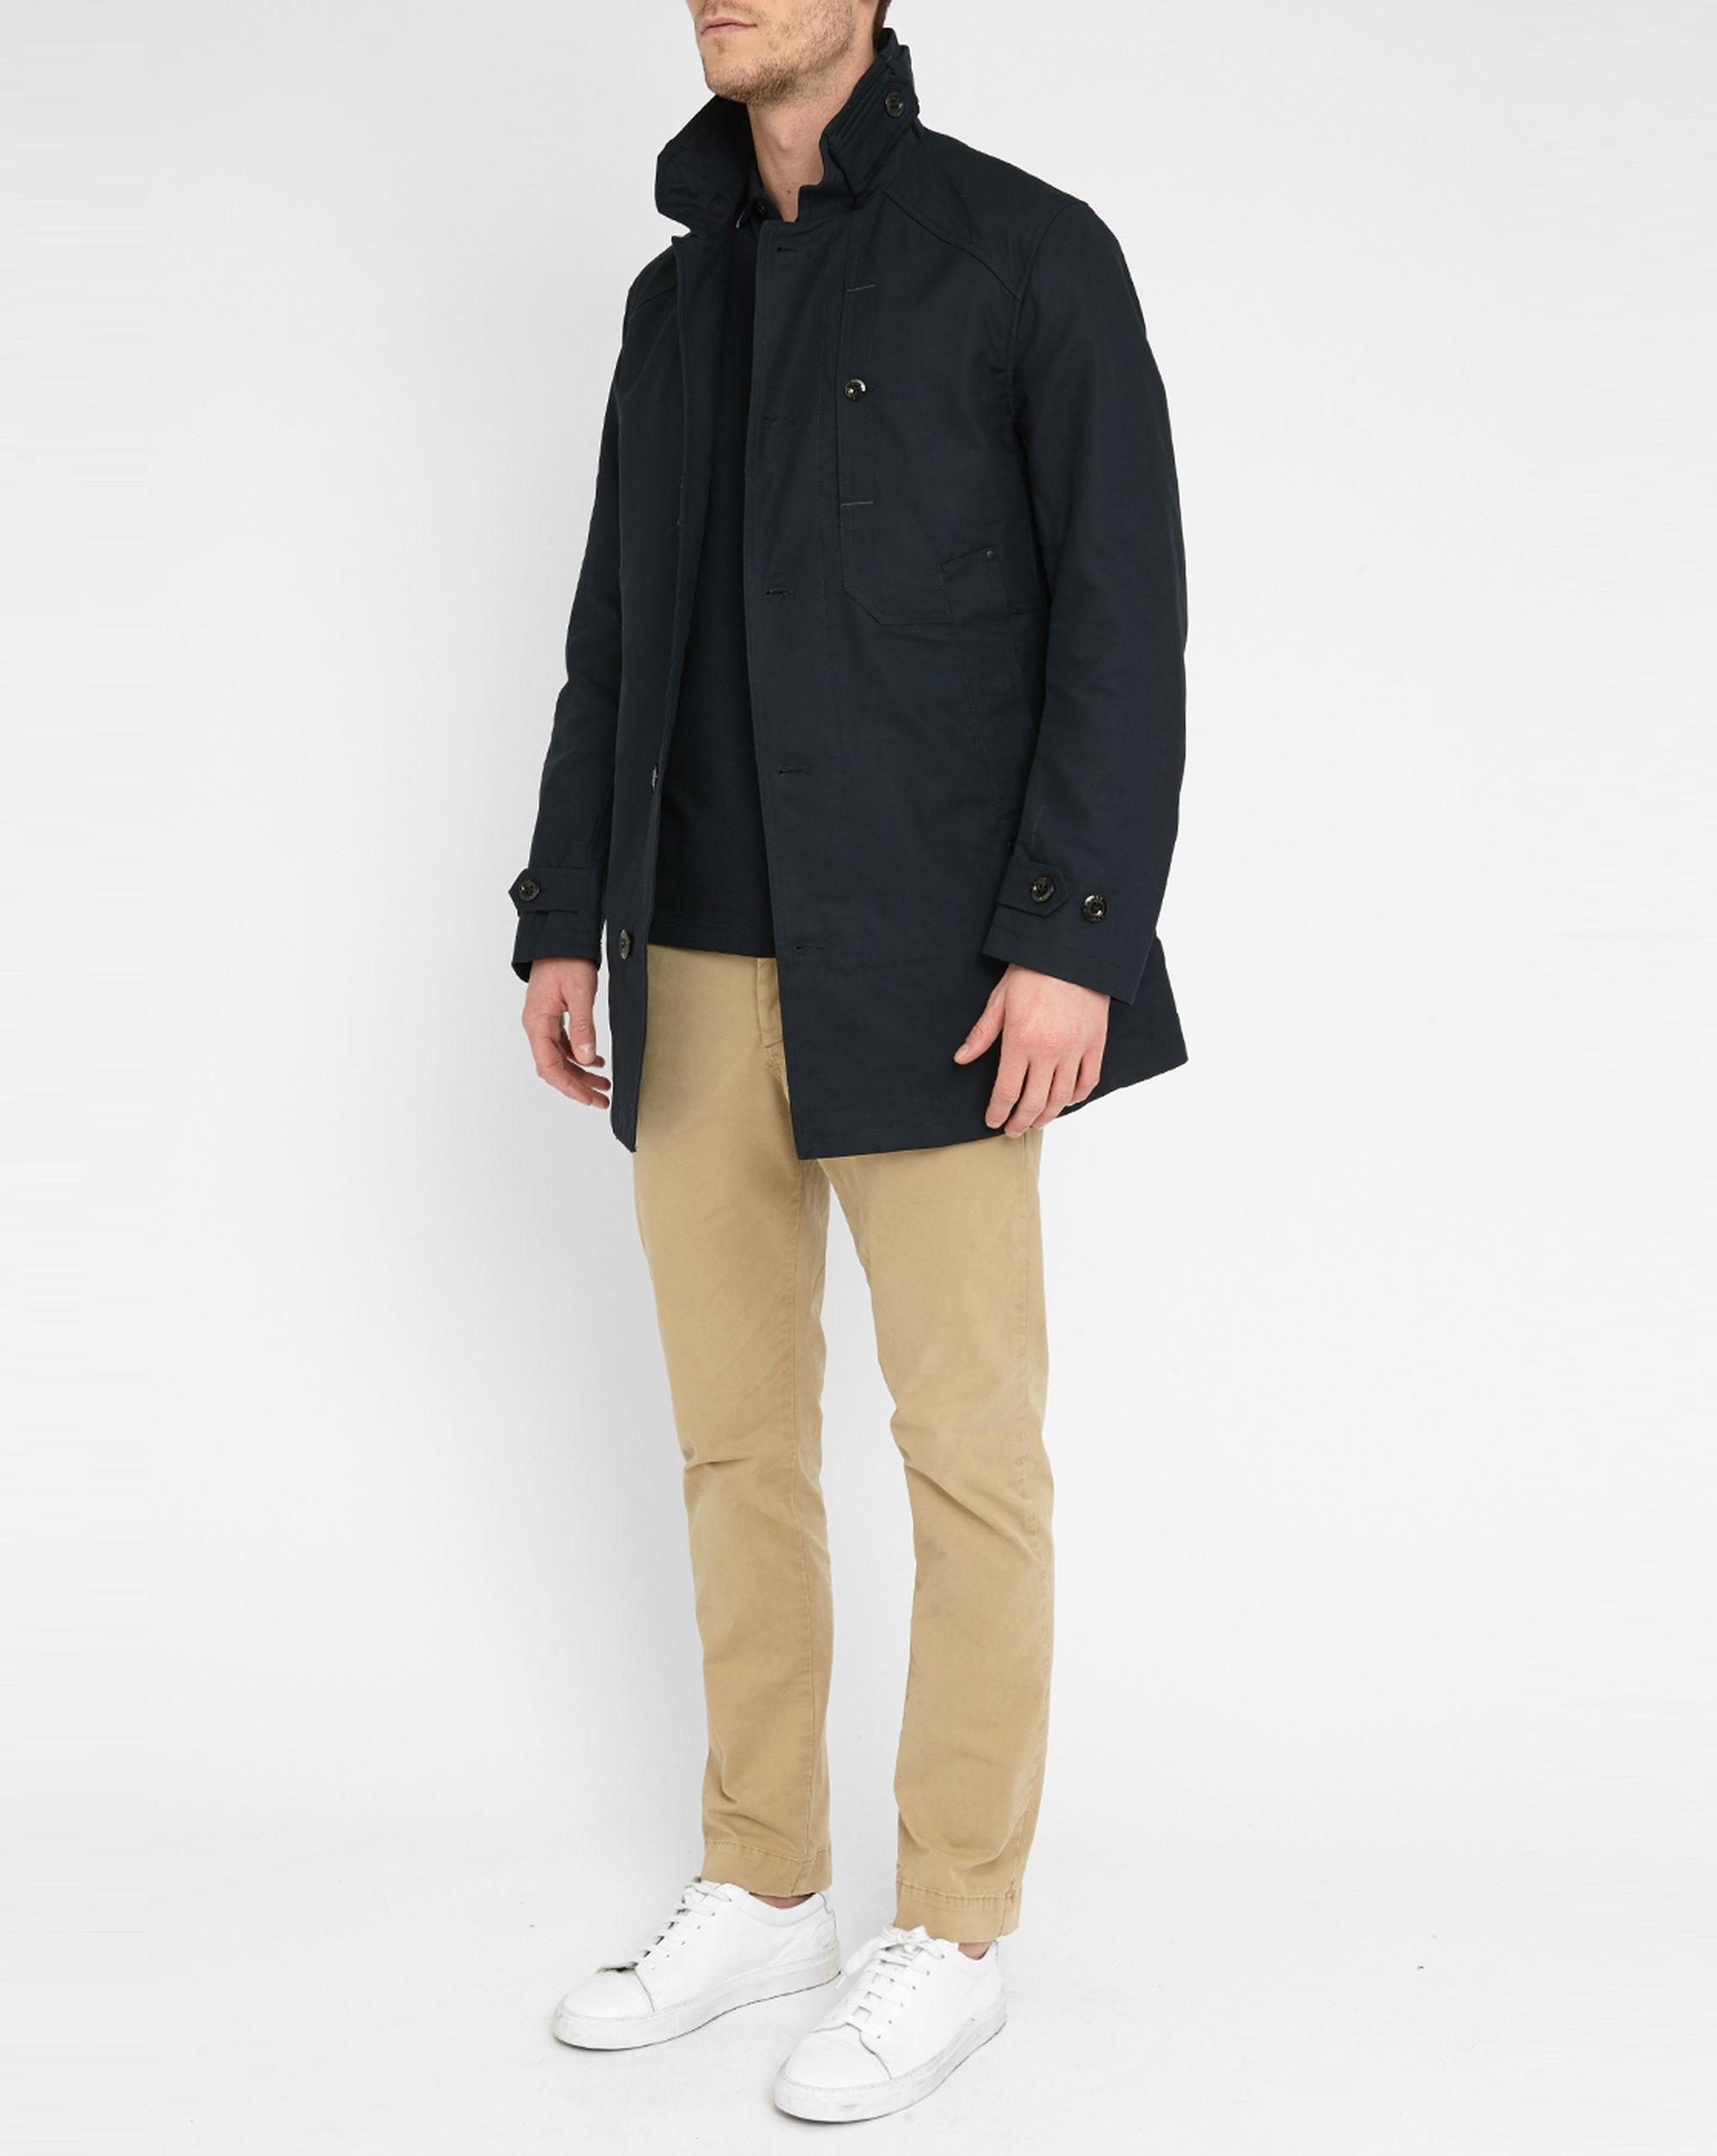 g star raw navy garber trench coat in blue for men lyst. Black Bedroom Furniture Sets. Home Design Ideas